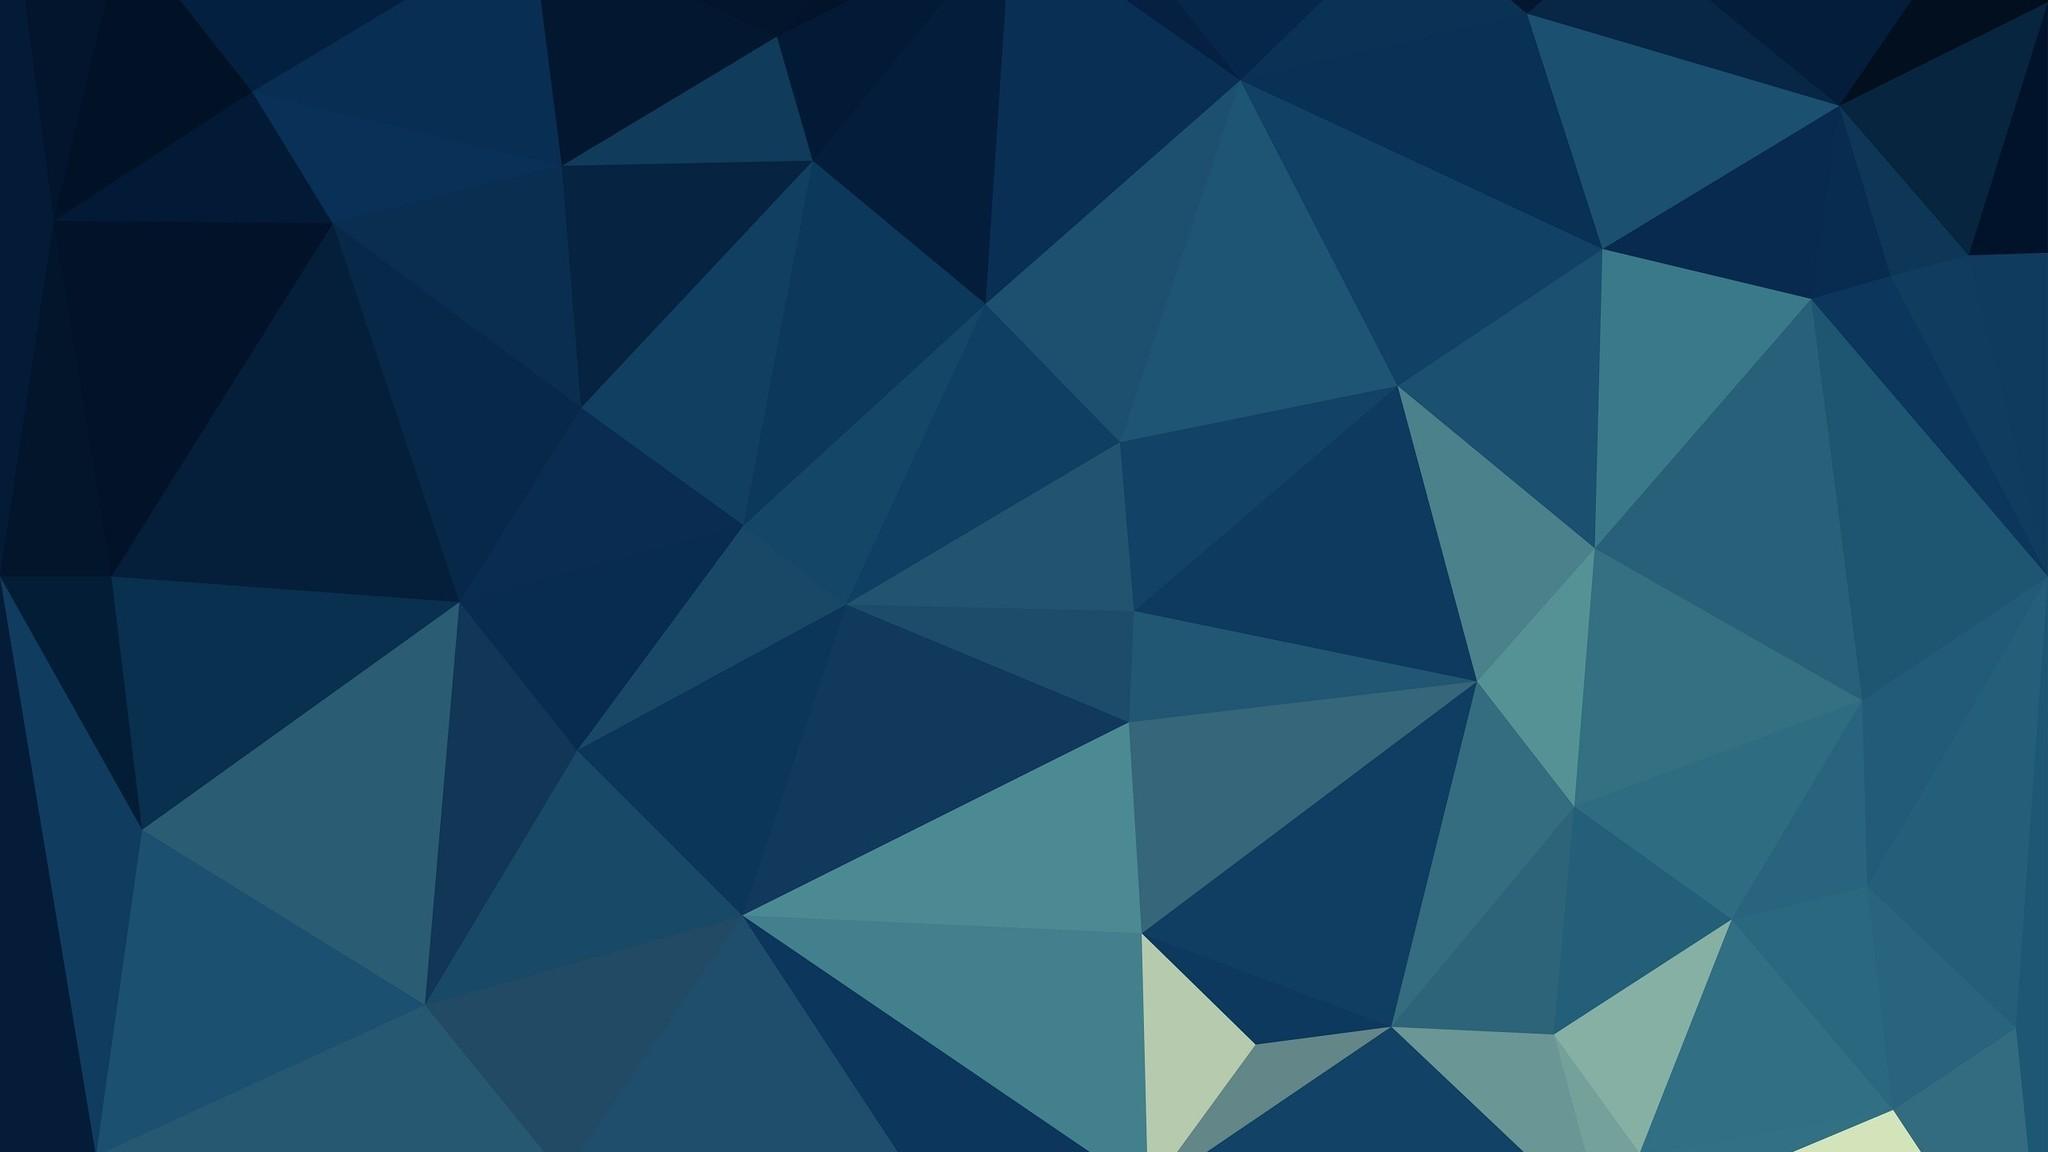 Download Minimalism Triangle Art HD 4k Wallpapers In Screen